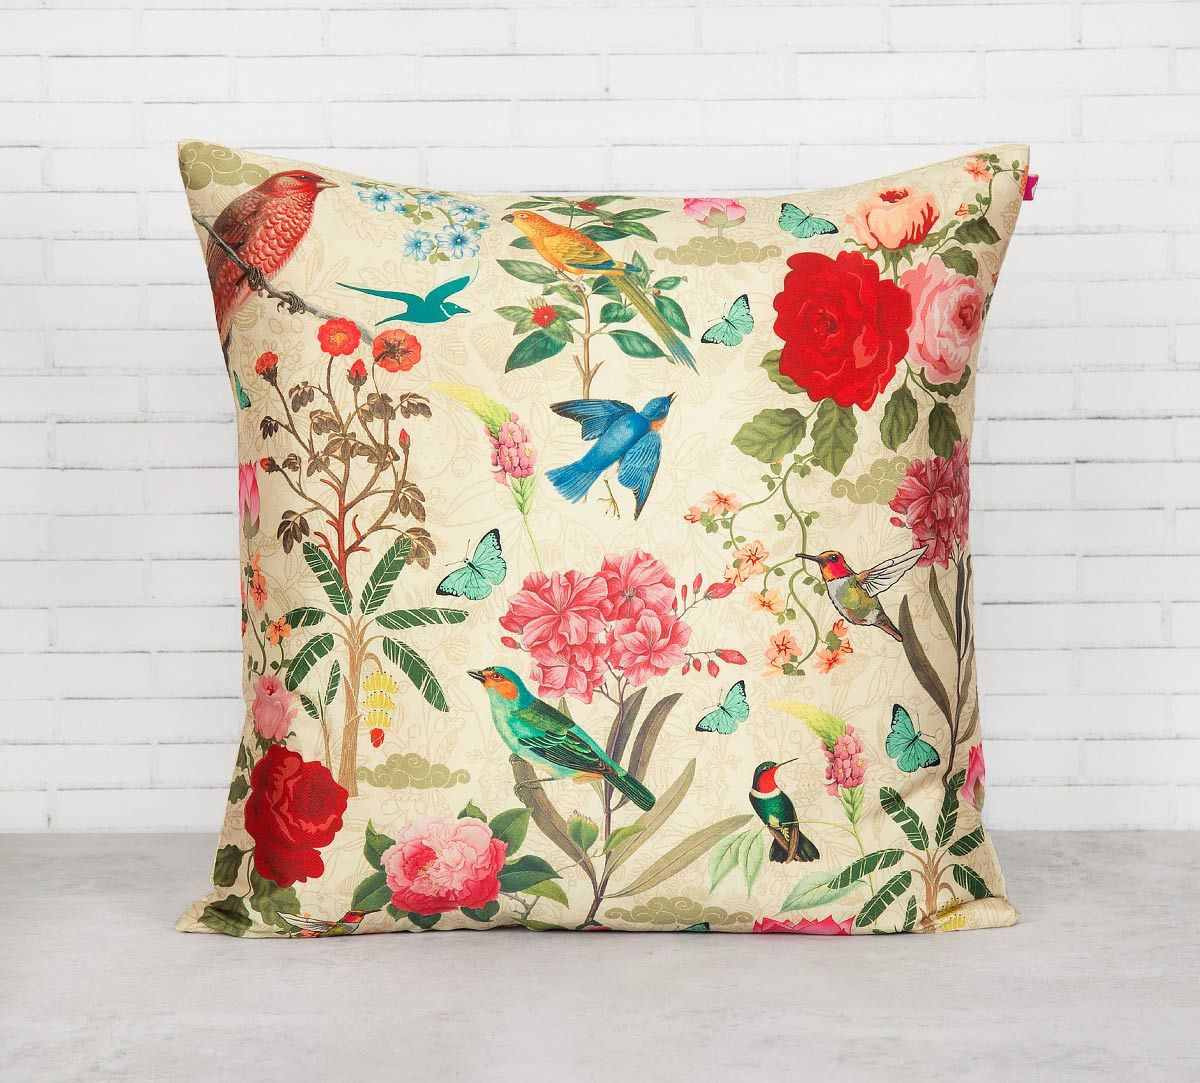 India Circus Bird Land Blended Taf Silk Cushion Cover